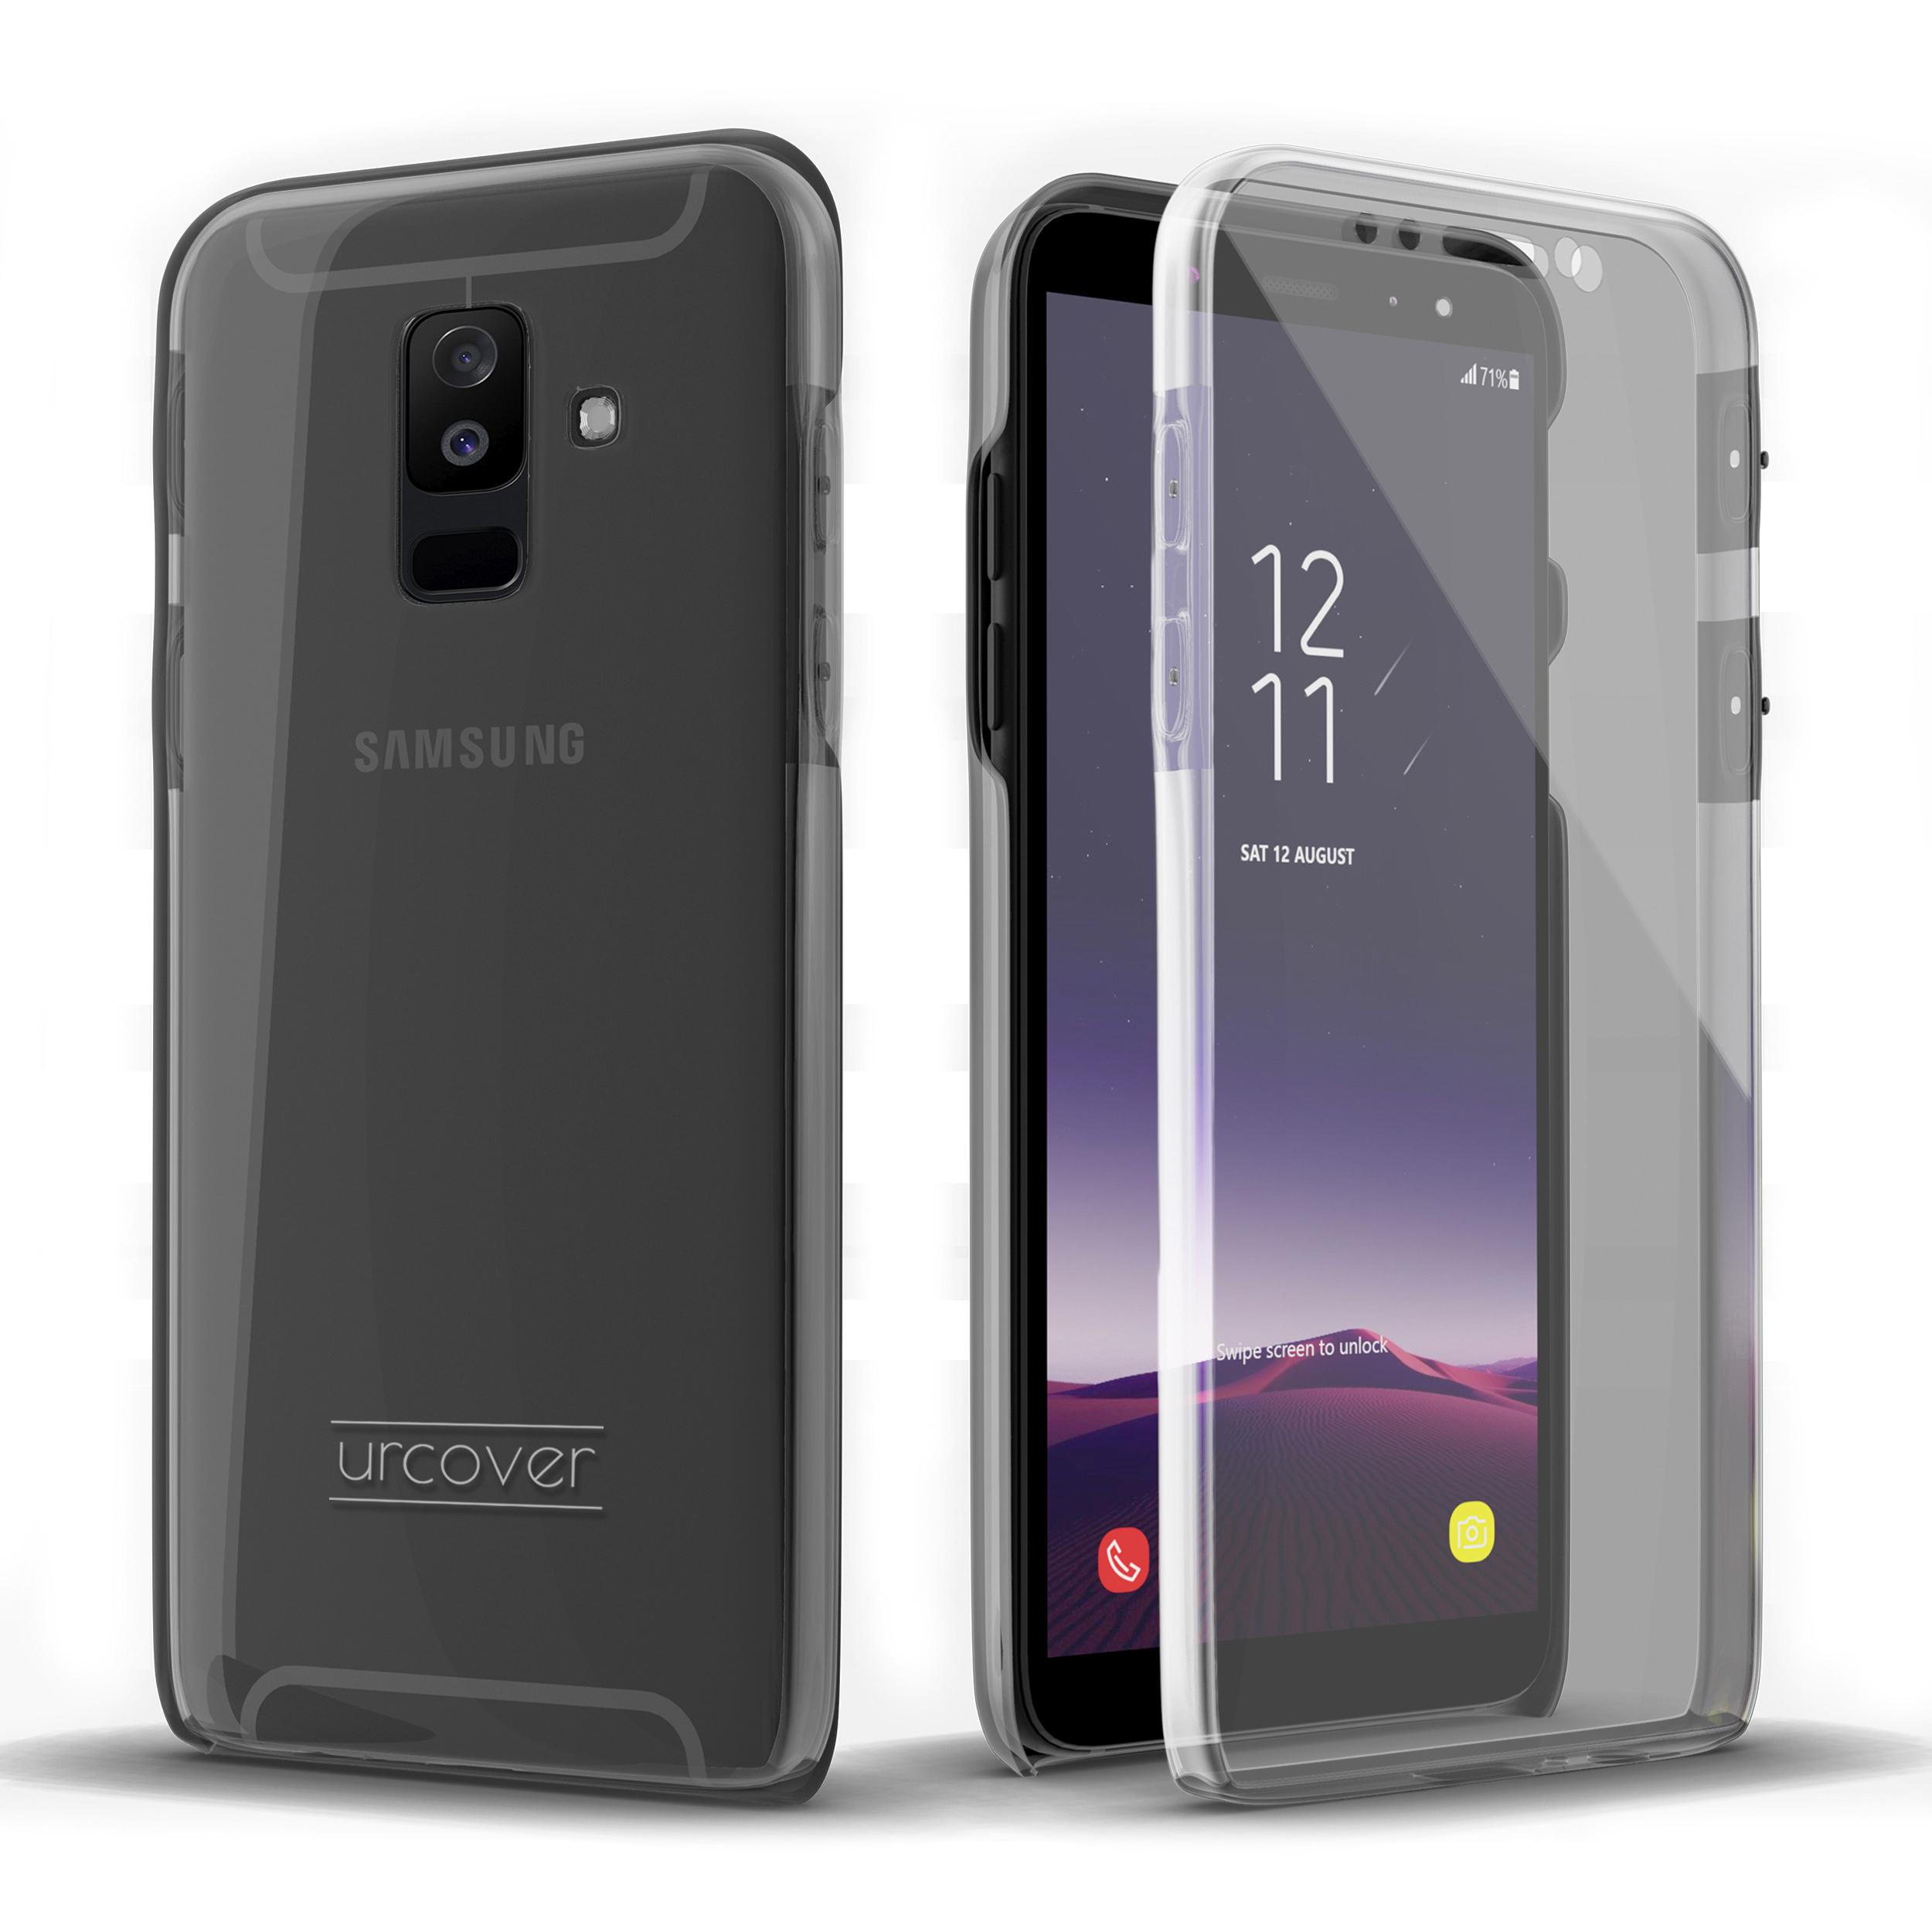 galaxy a6 plus 2018 smartphone samsung urcover. Black Bedroom Furniture Sets. Home Design Ideas